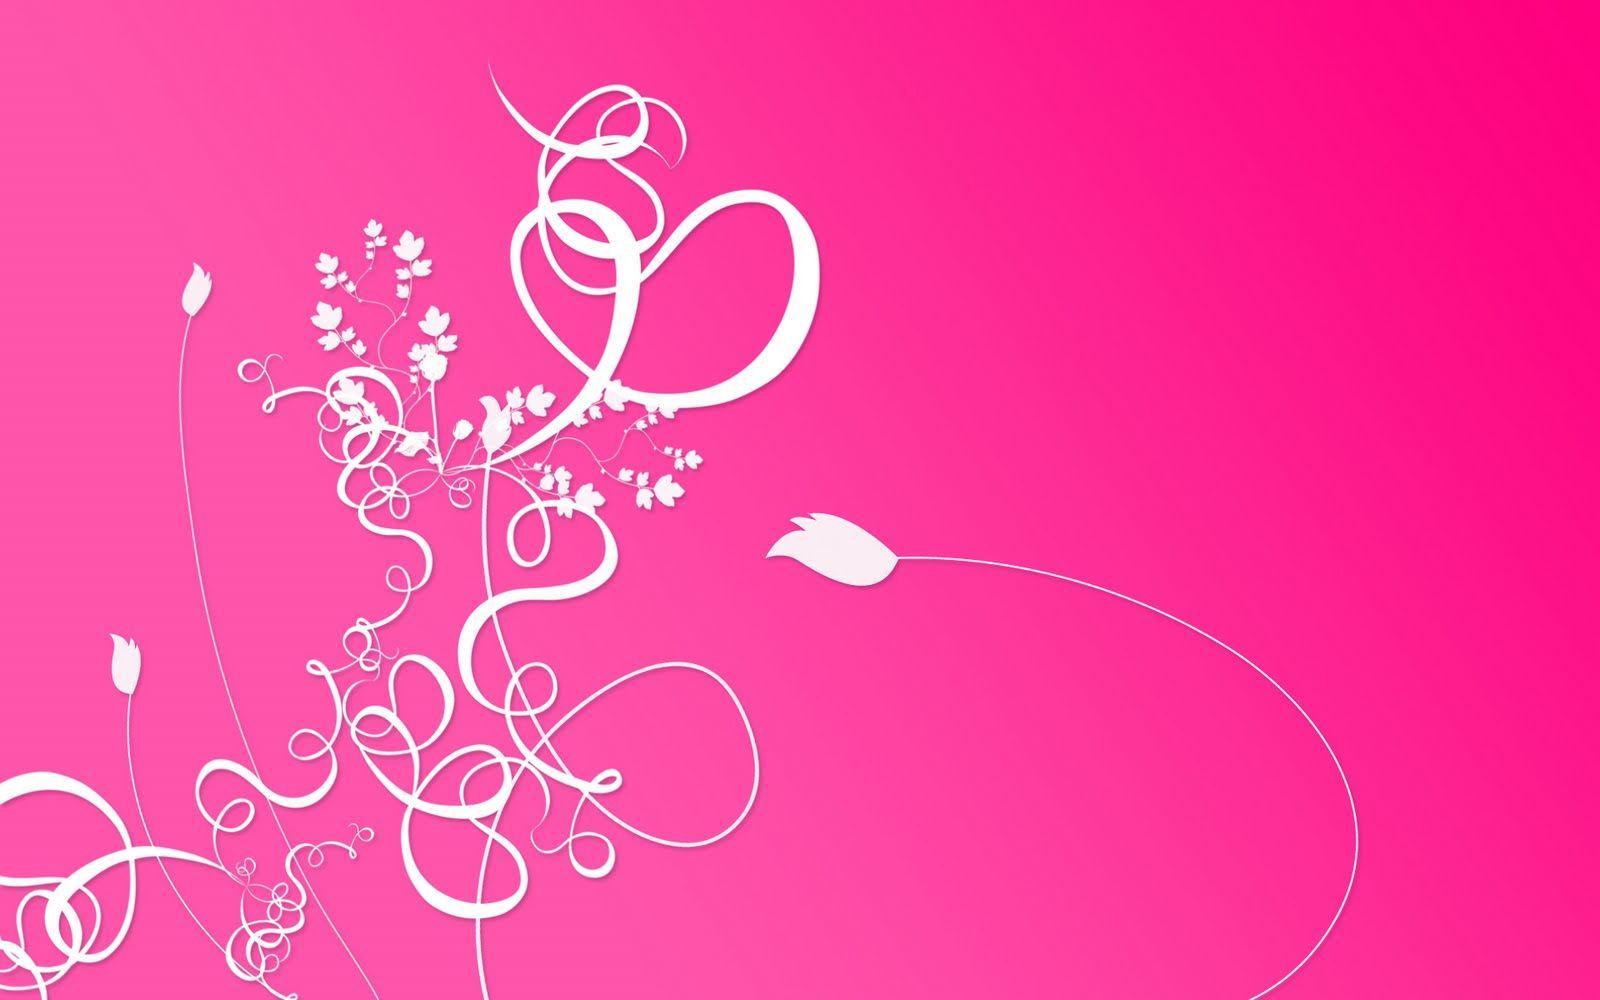 hp wallpaper pink - photo #20